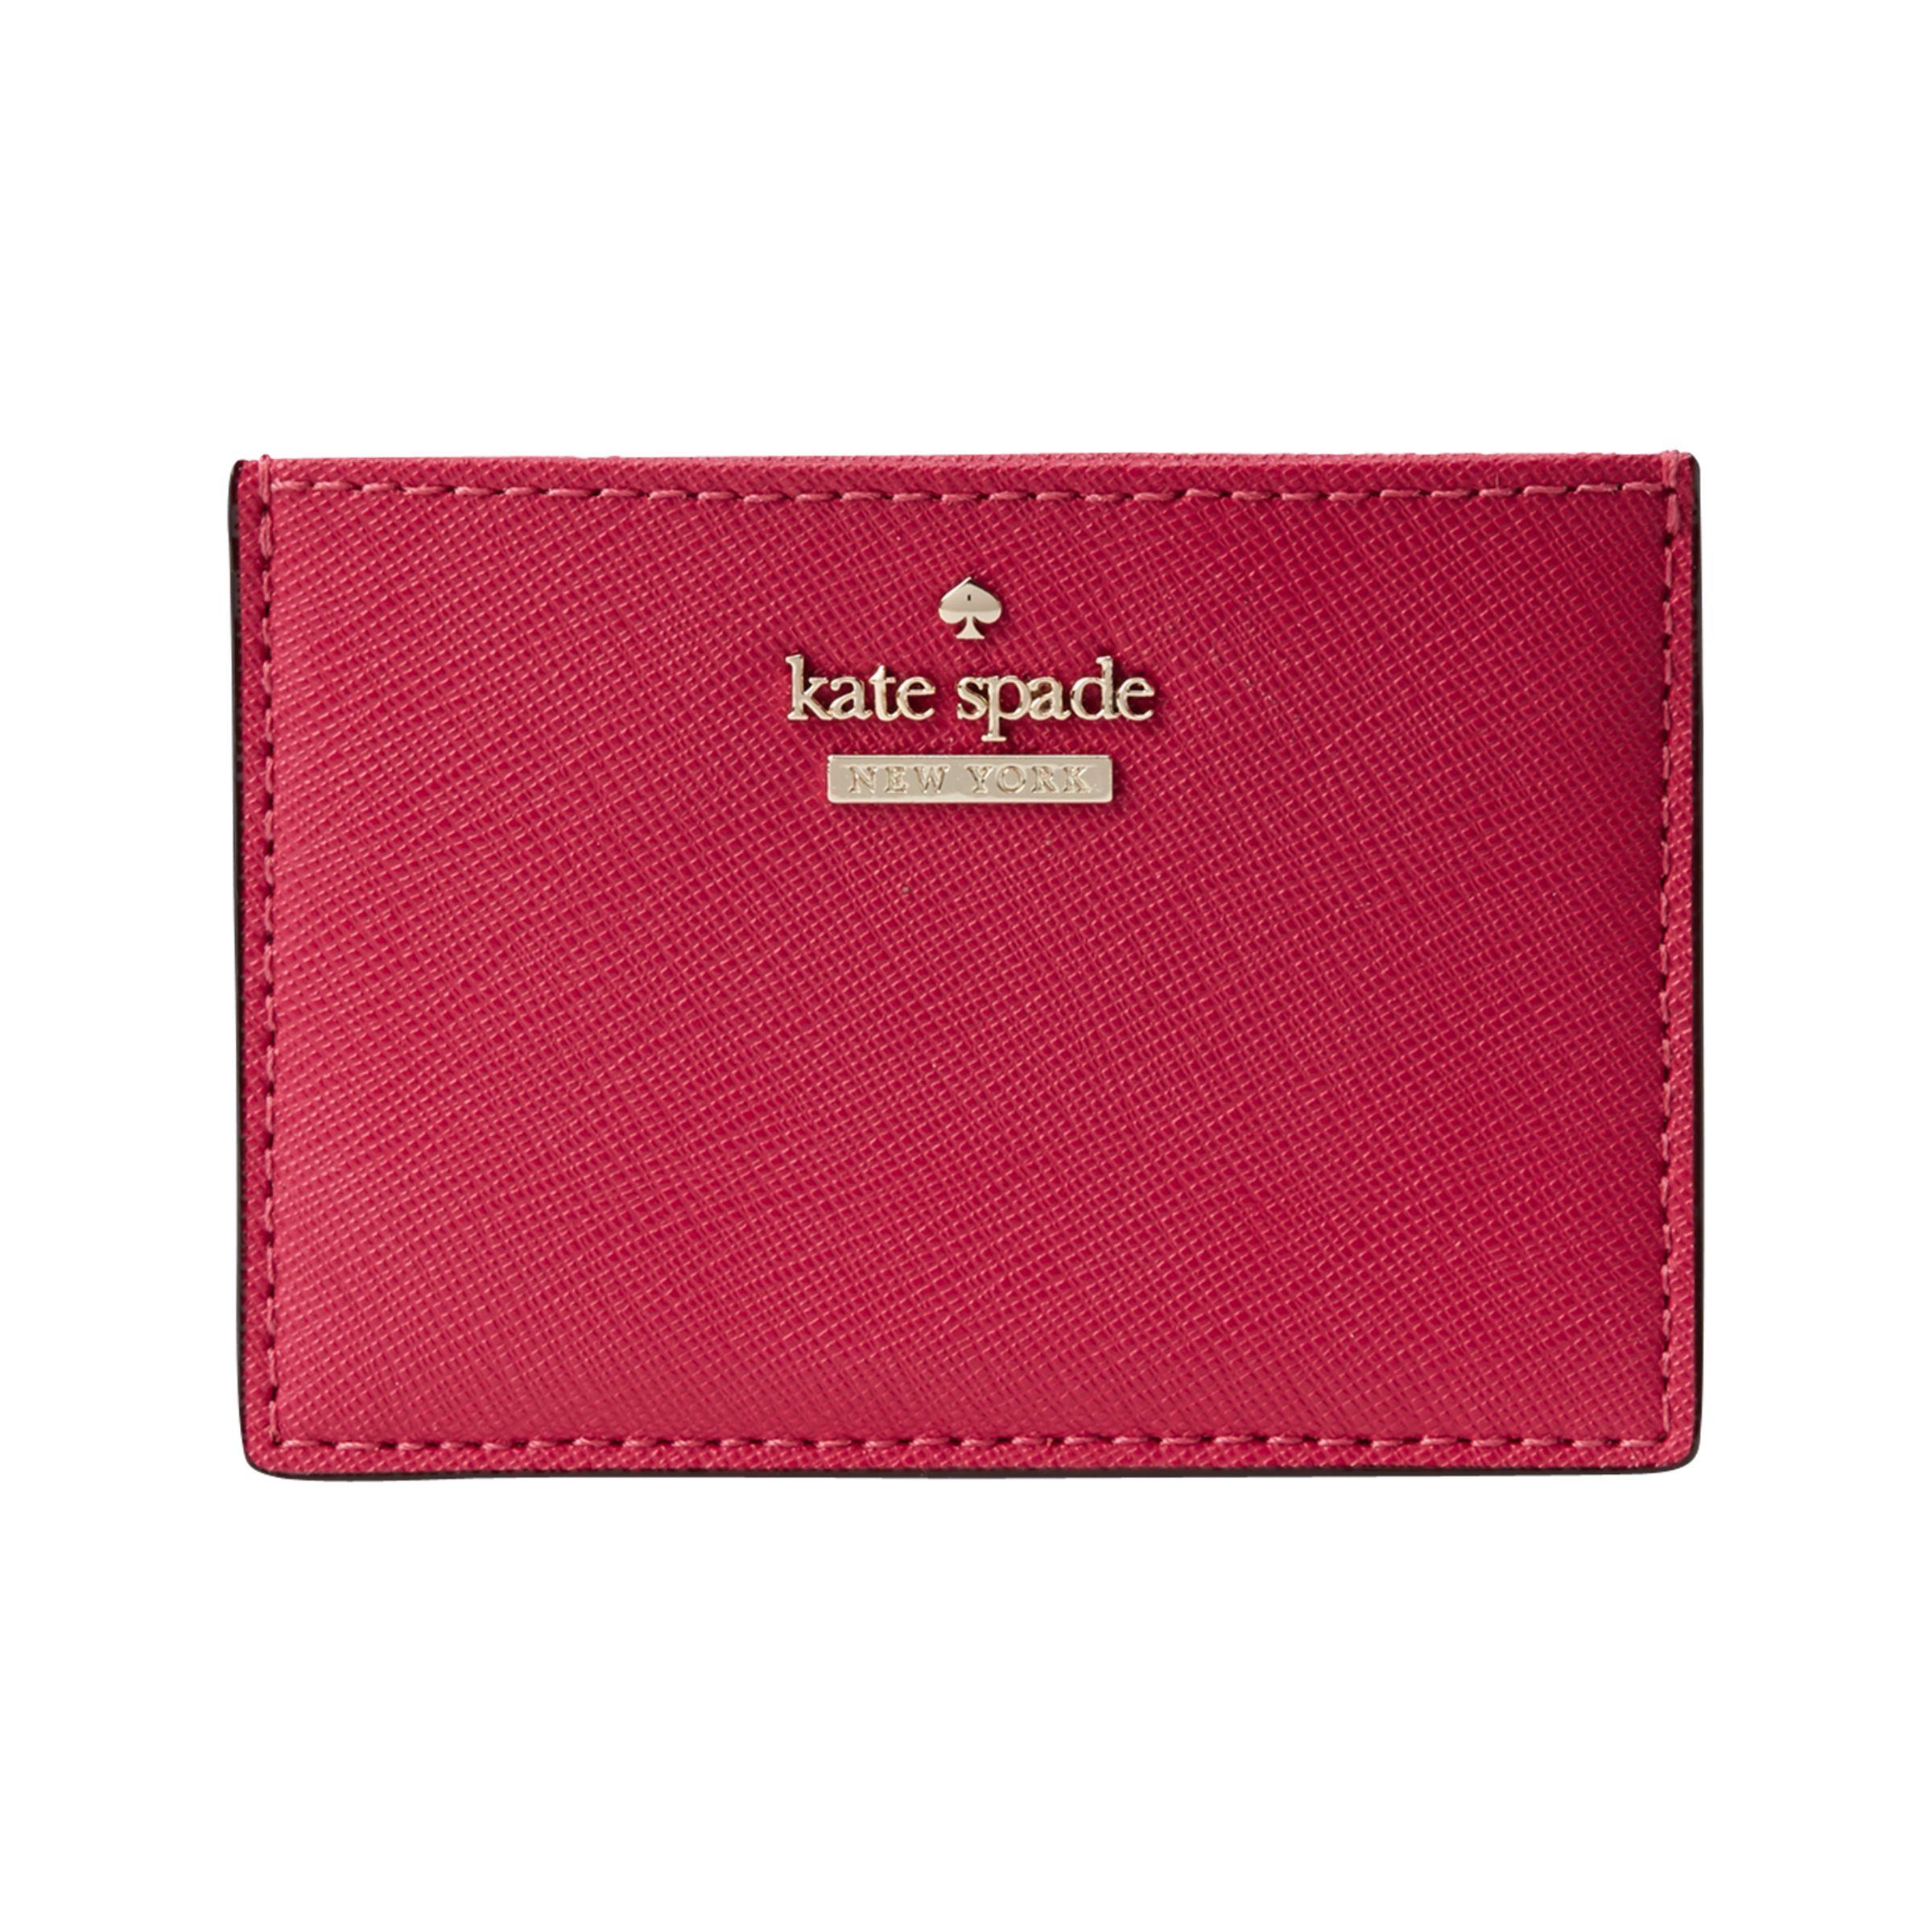 kate spade new york kate spade new york Cedar Street Leather Card Holder